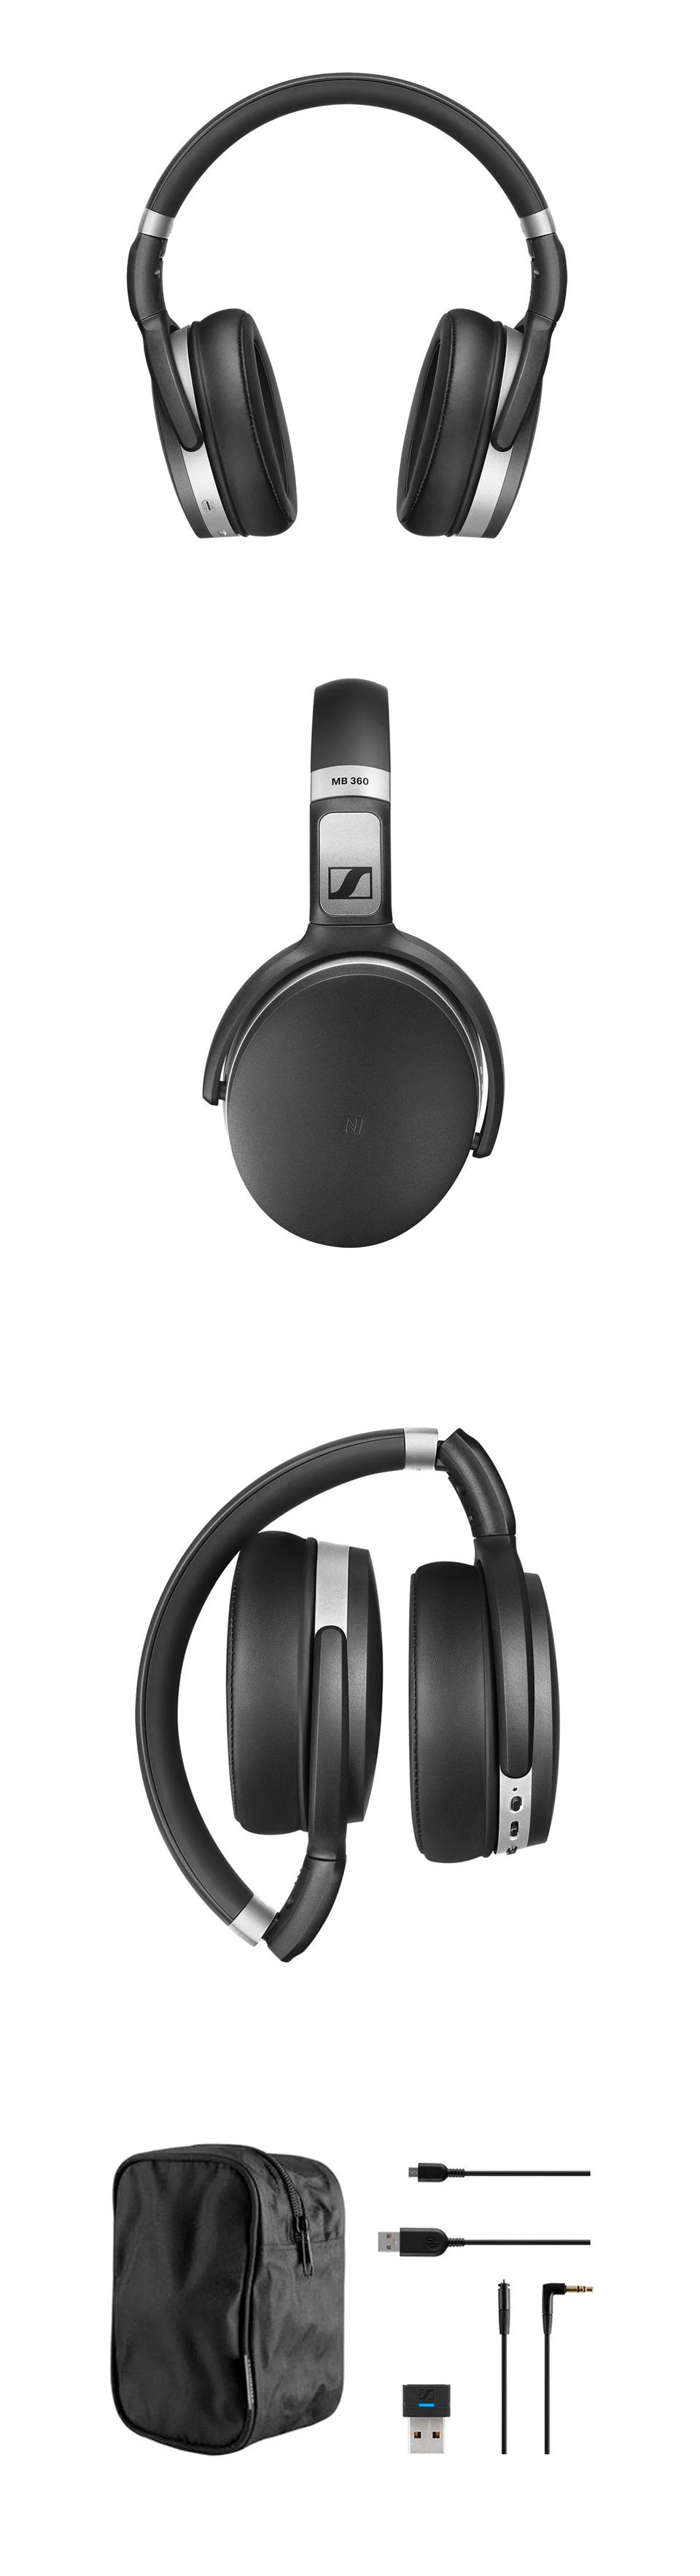 Sennheiser MB 360 UC Bluetooth Headset product